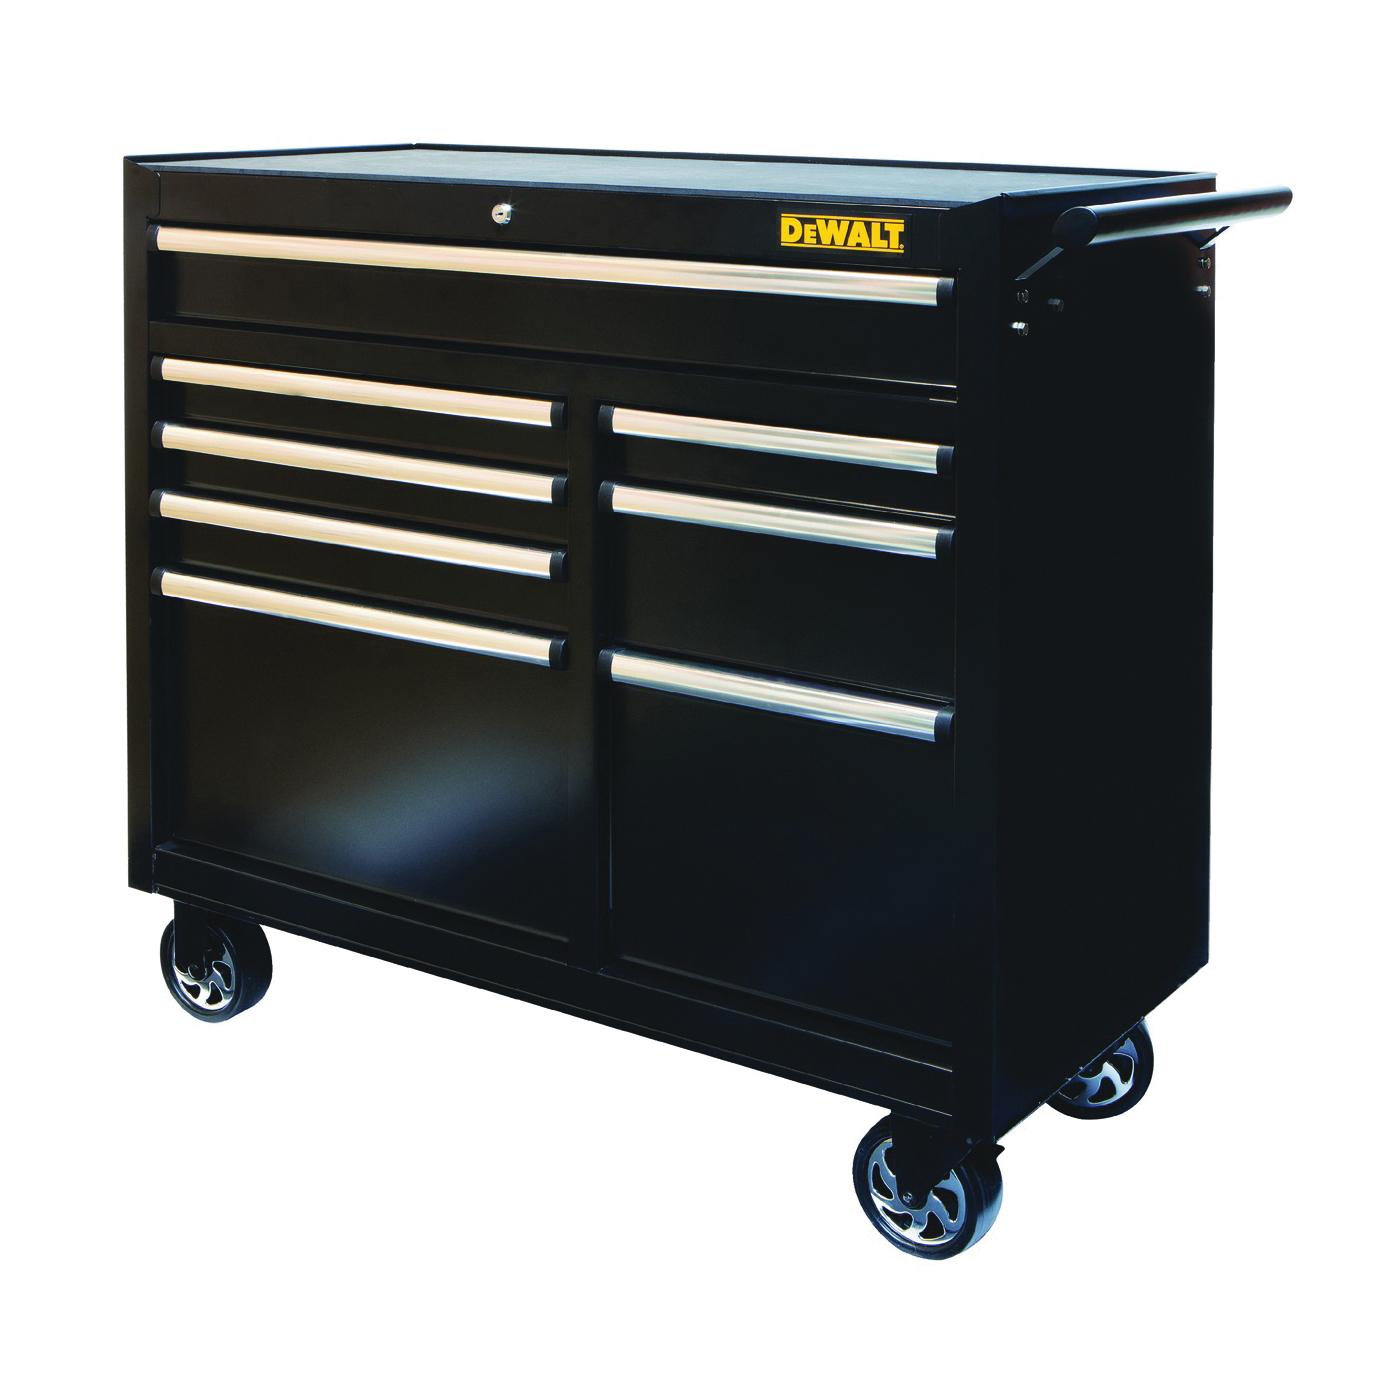 Picture of DeWALT DWMT81245 Drawer Cabinet, 12,533 cu-in Capacity, 40 in W, 38 in H, 8 -Drawer, Steel, Black